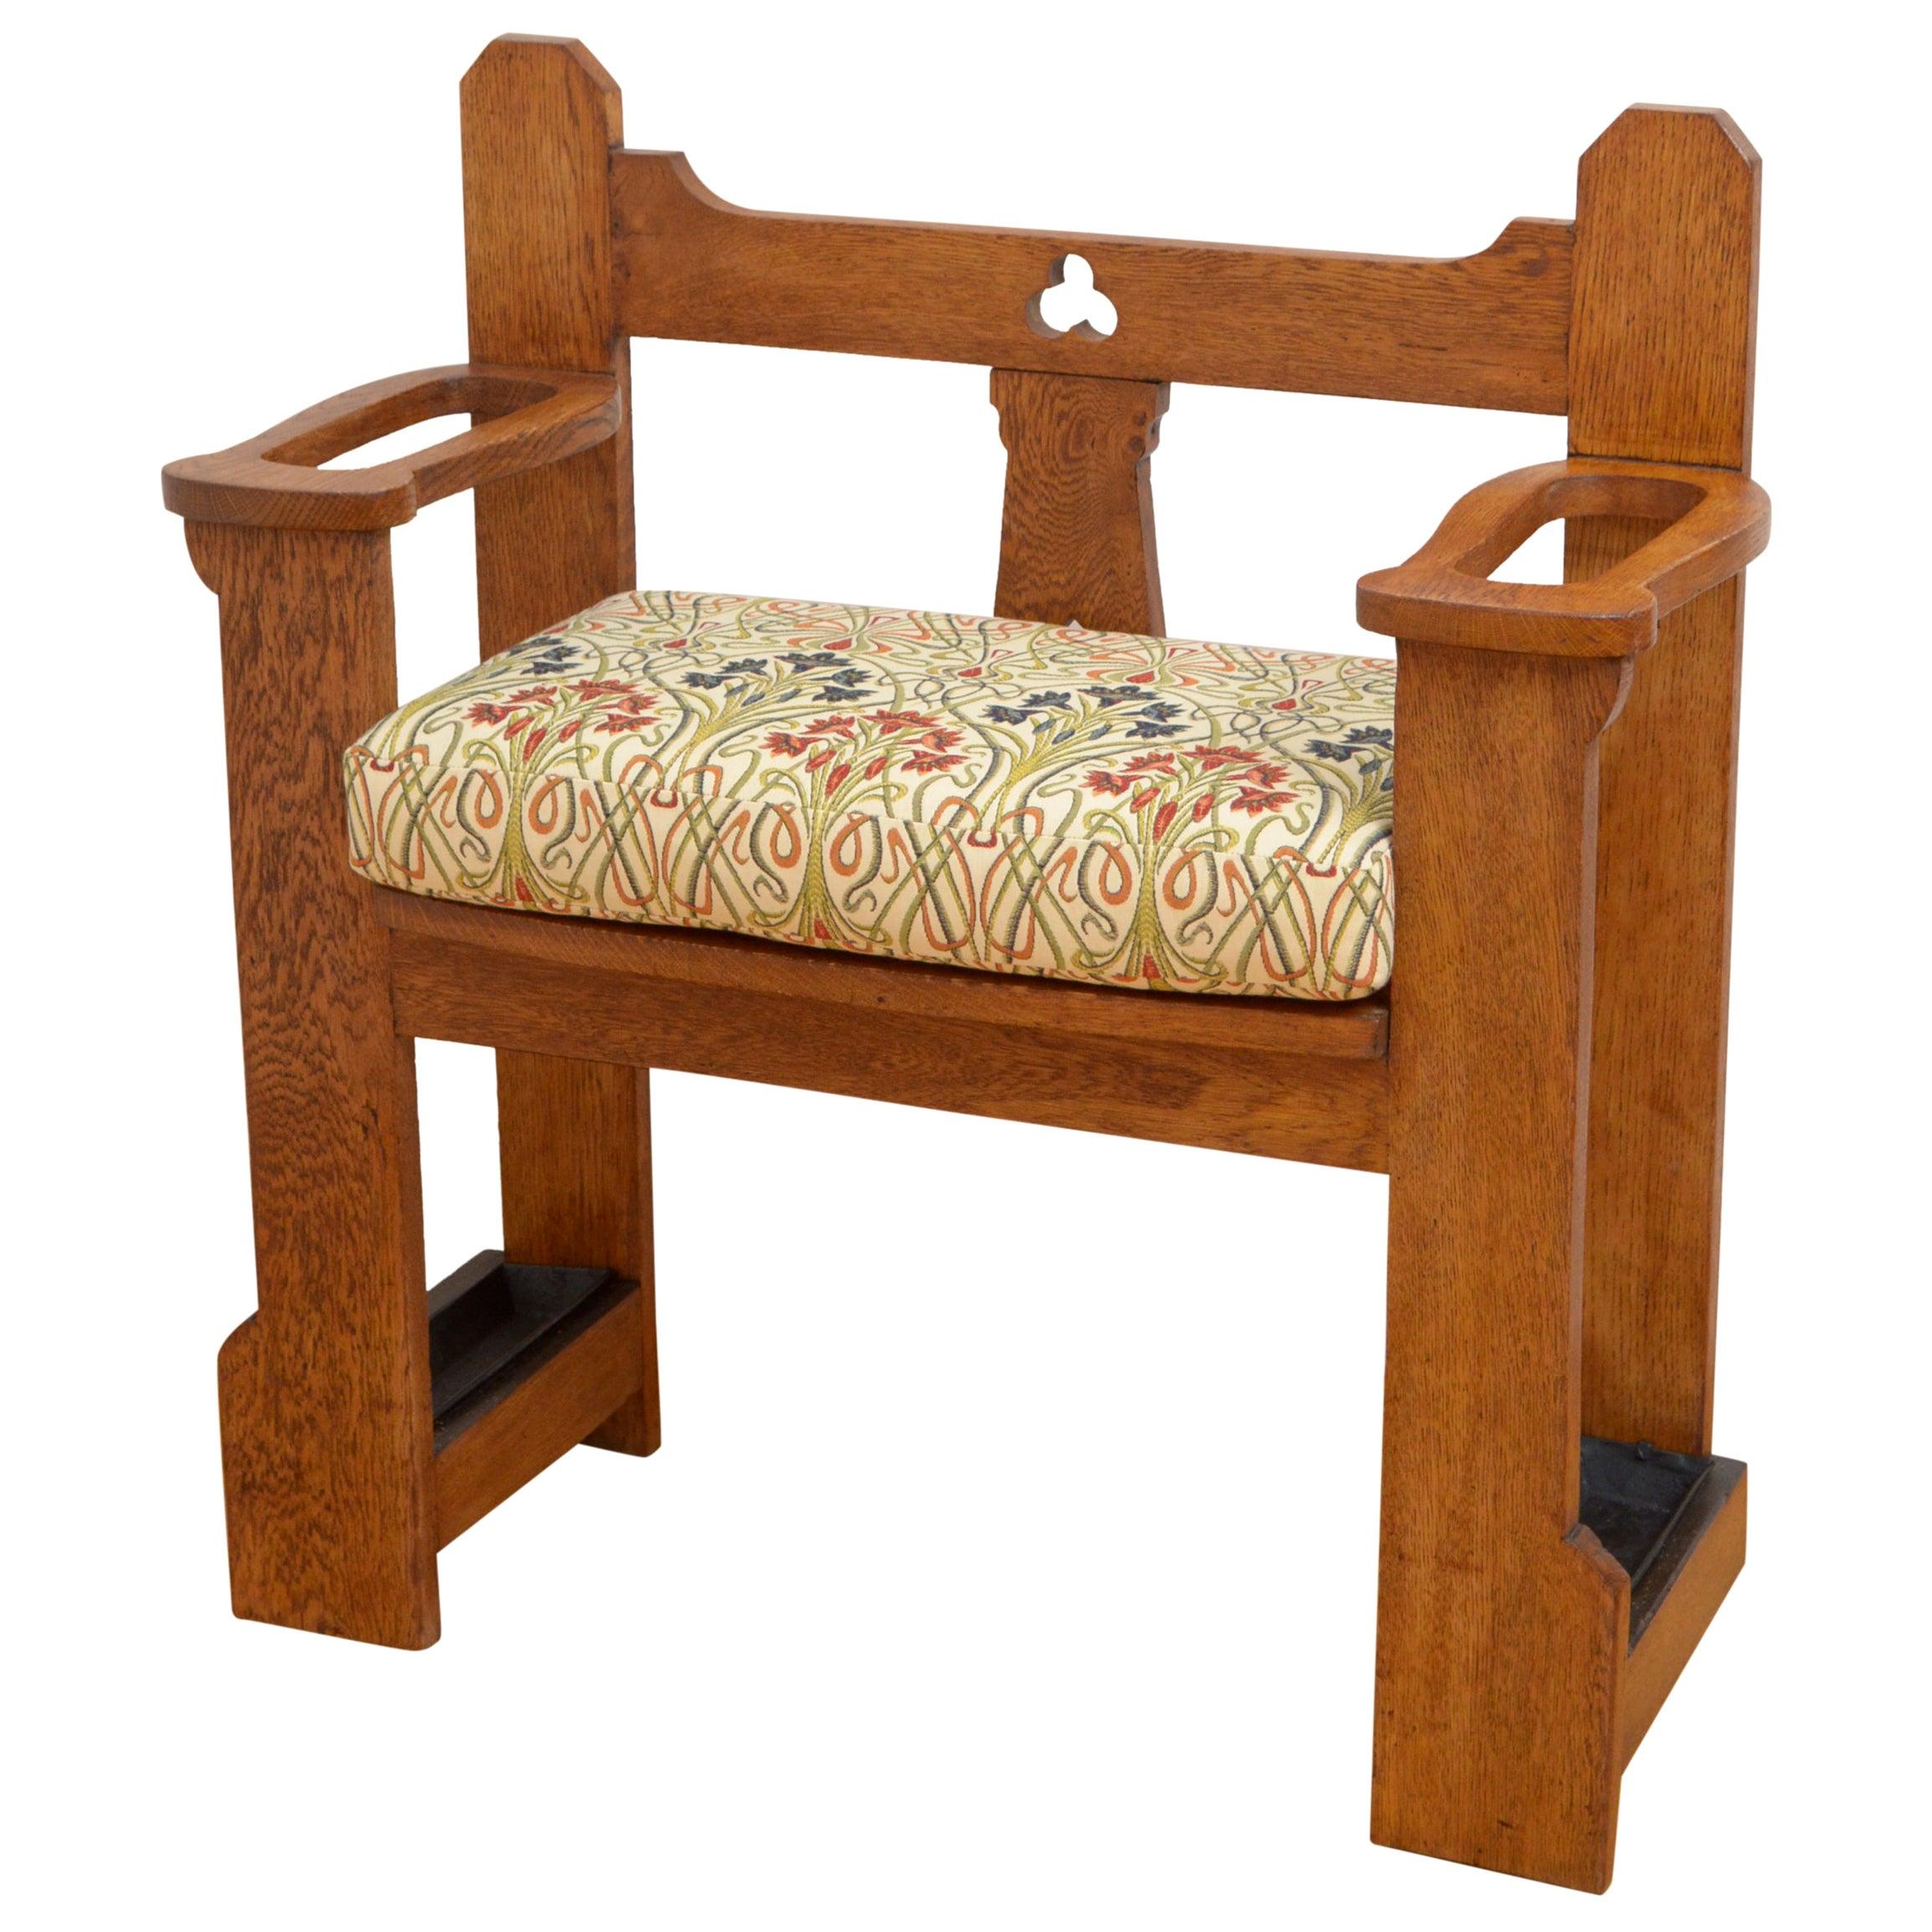 Stylish Arts & Crafts Oak Bench of Narrow Proportions